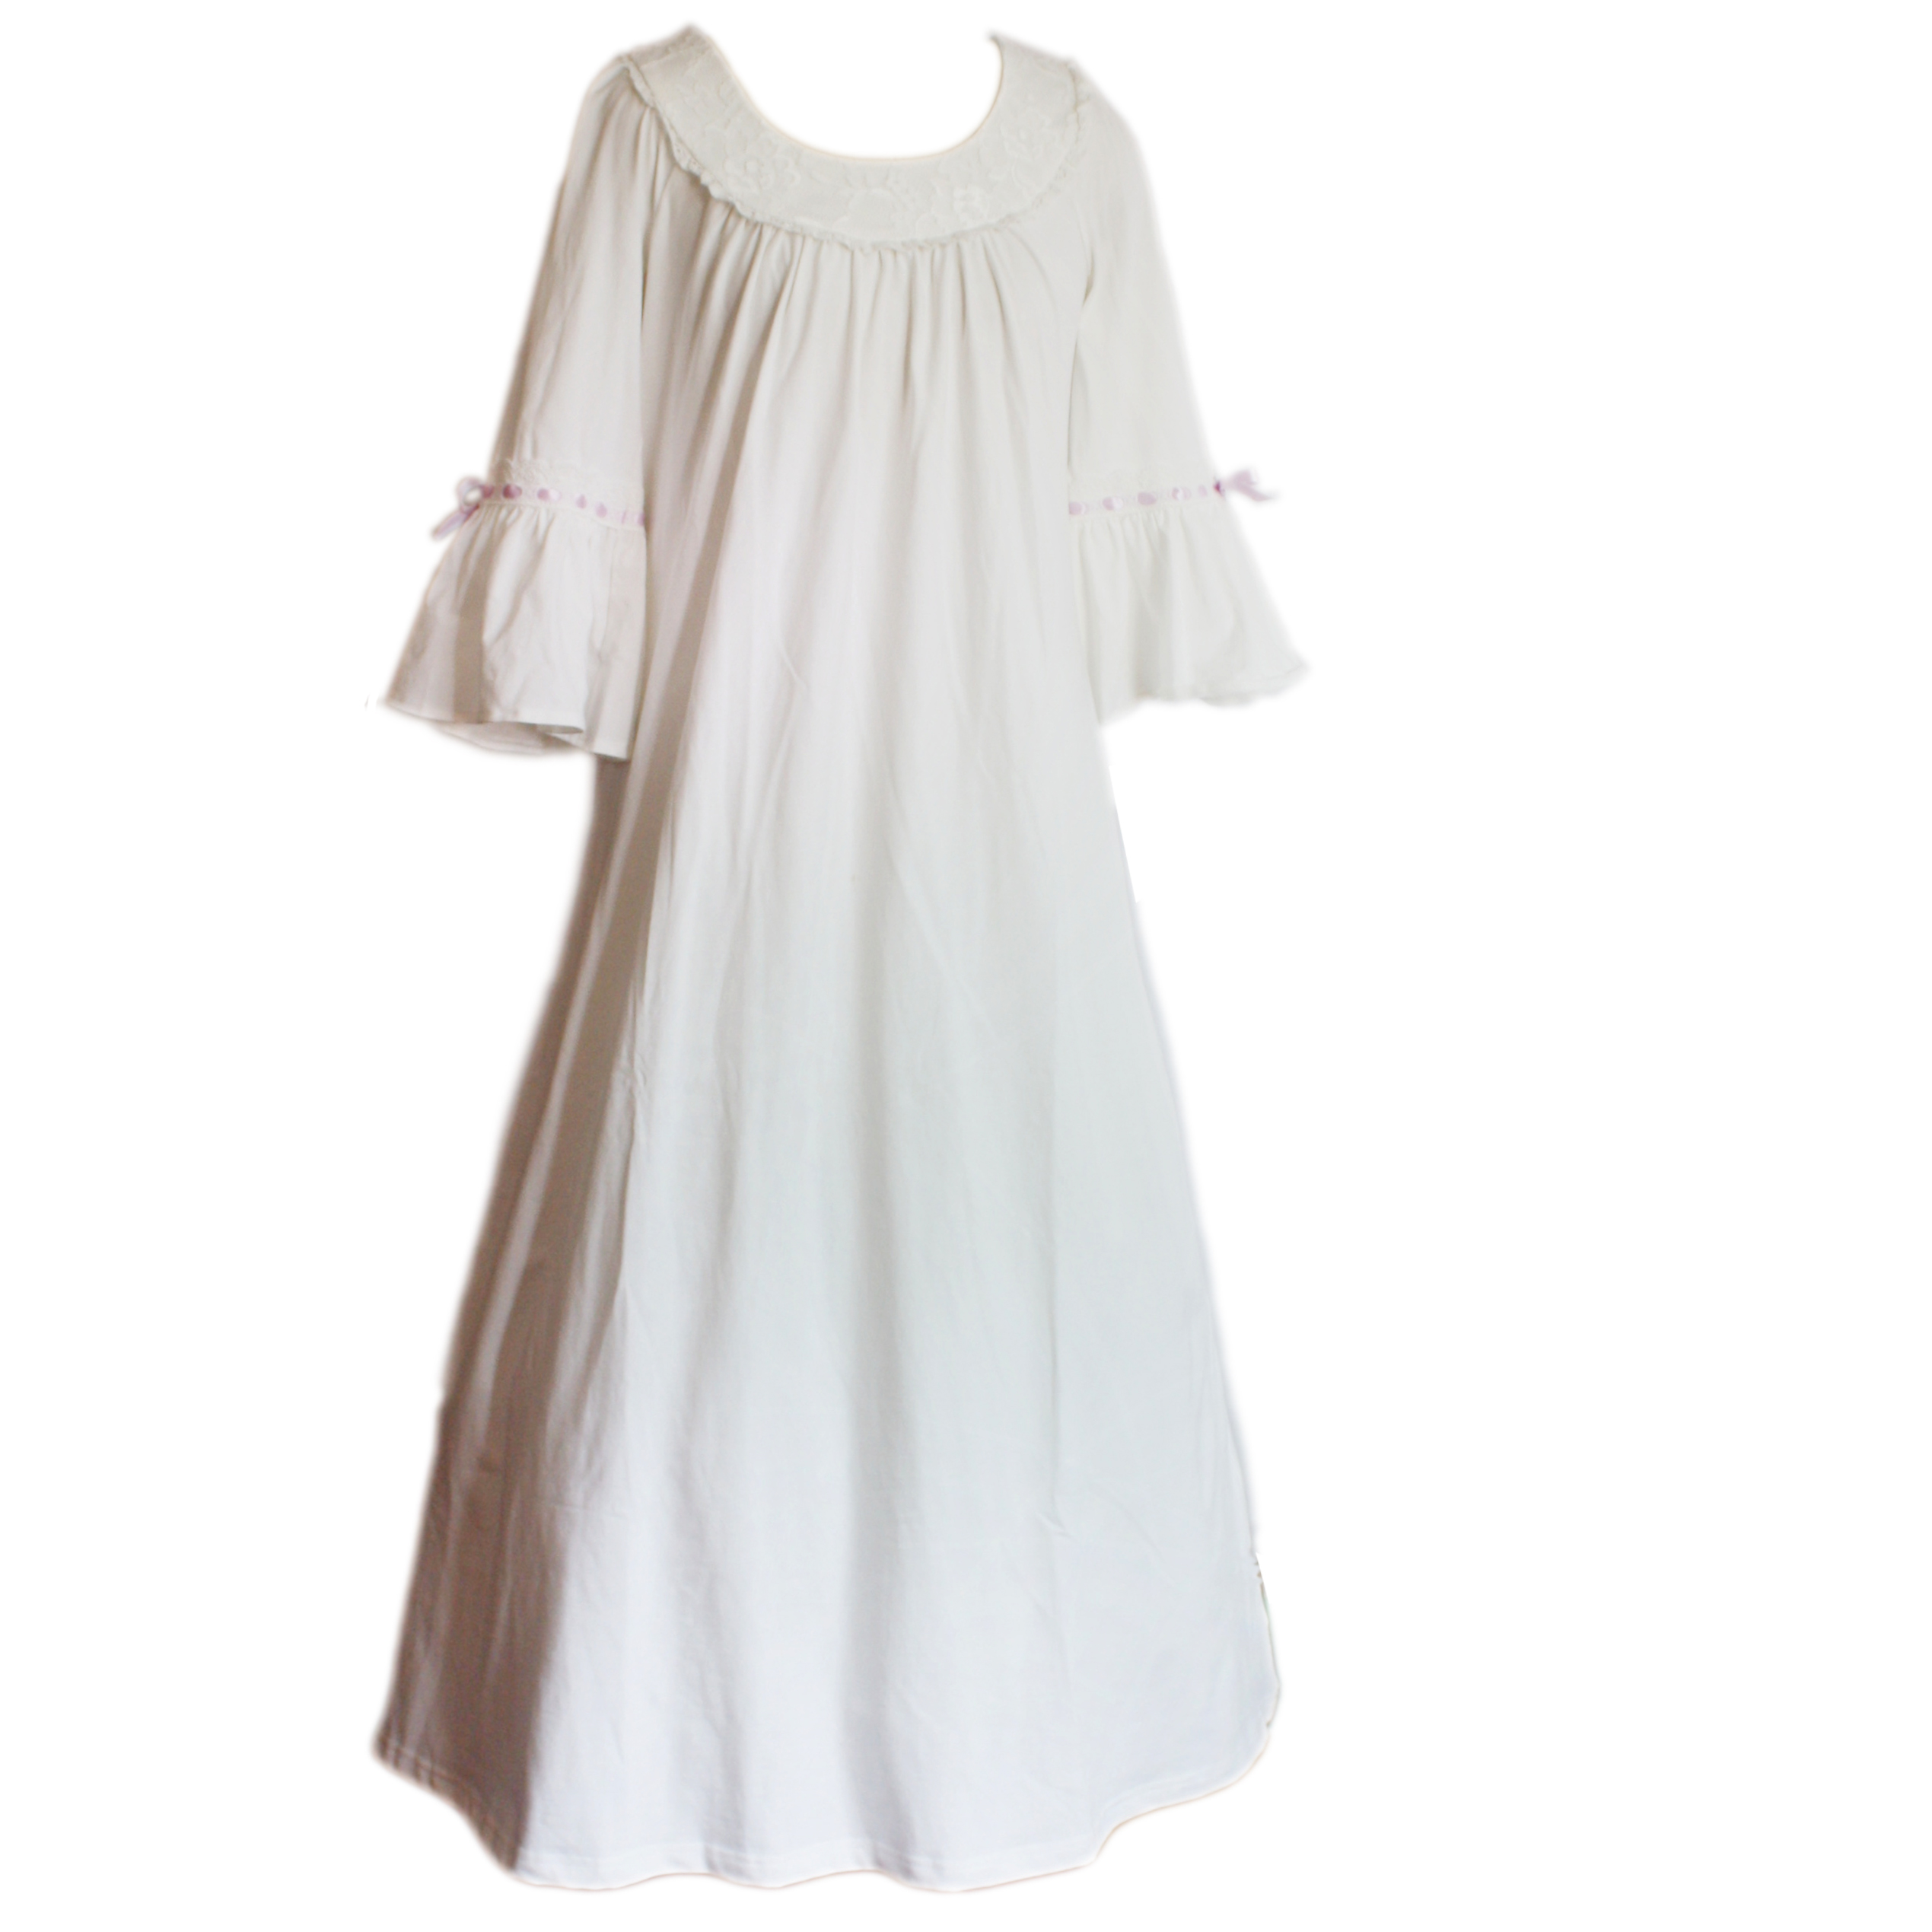 Algodón 100% blanco camisón niña larga nightgdress princesa pijamas ...